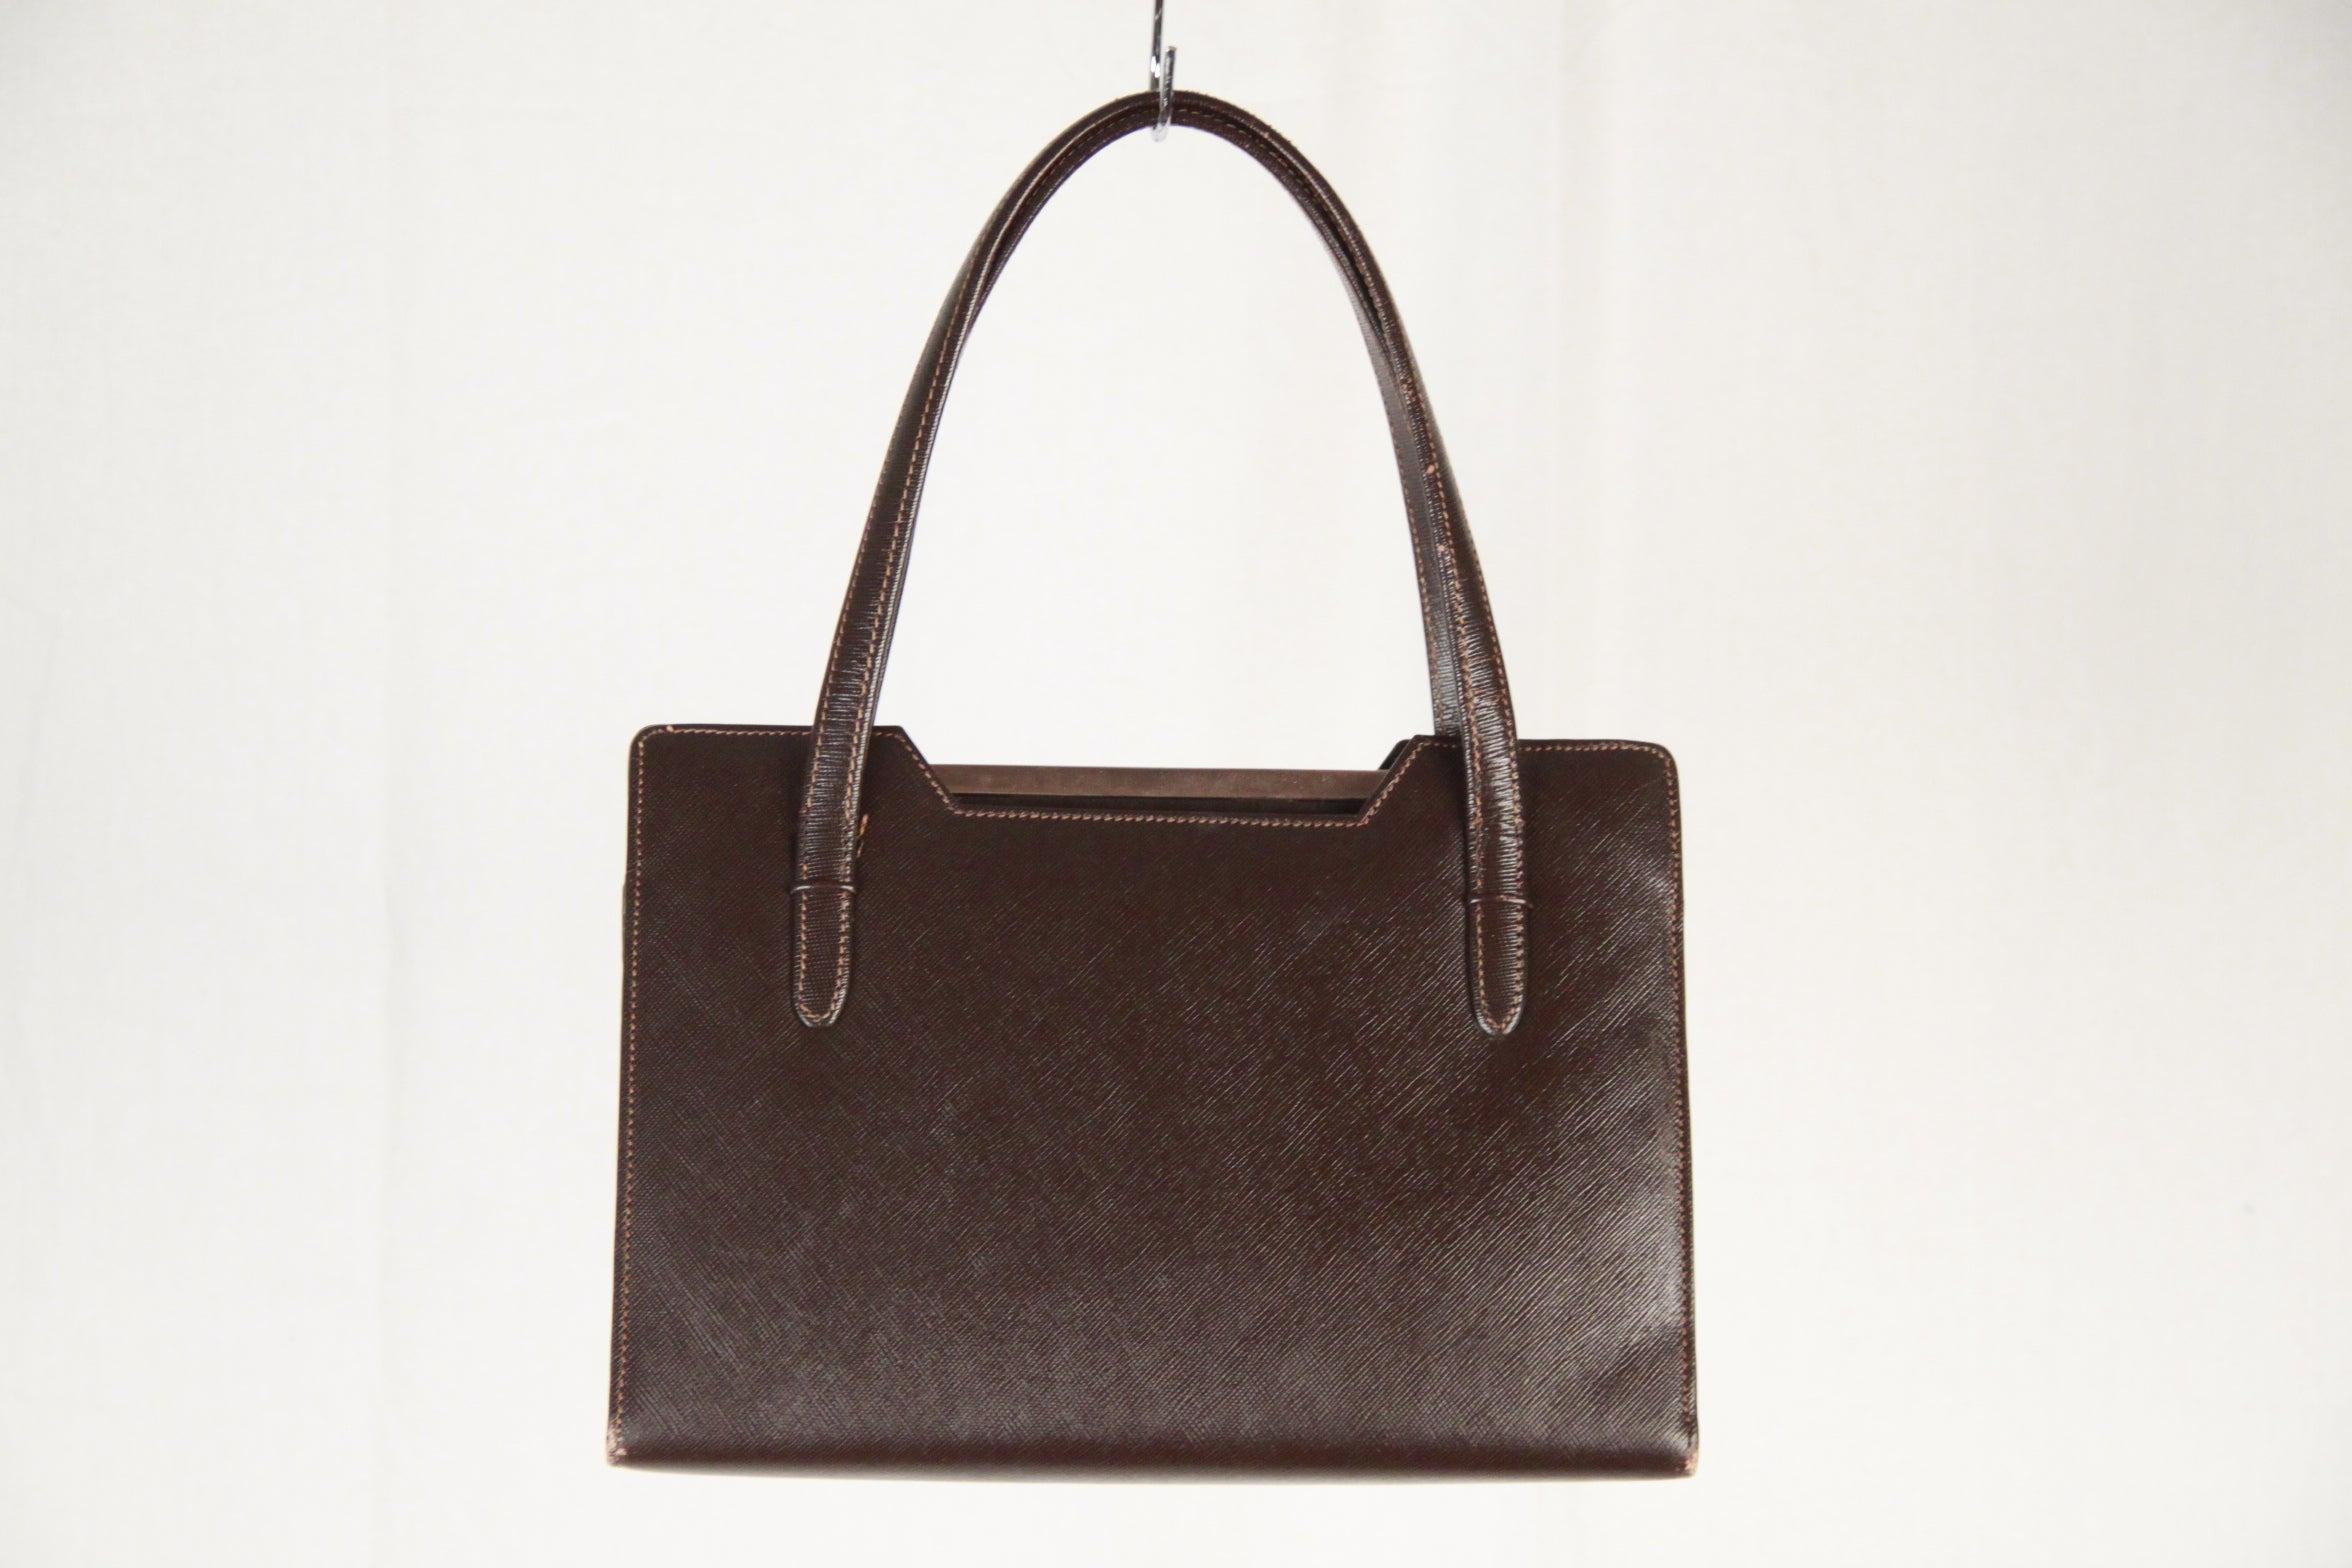 Gucci Vintage Brown Leather Handbag Top Handles Bag gr2cSN